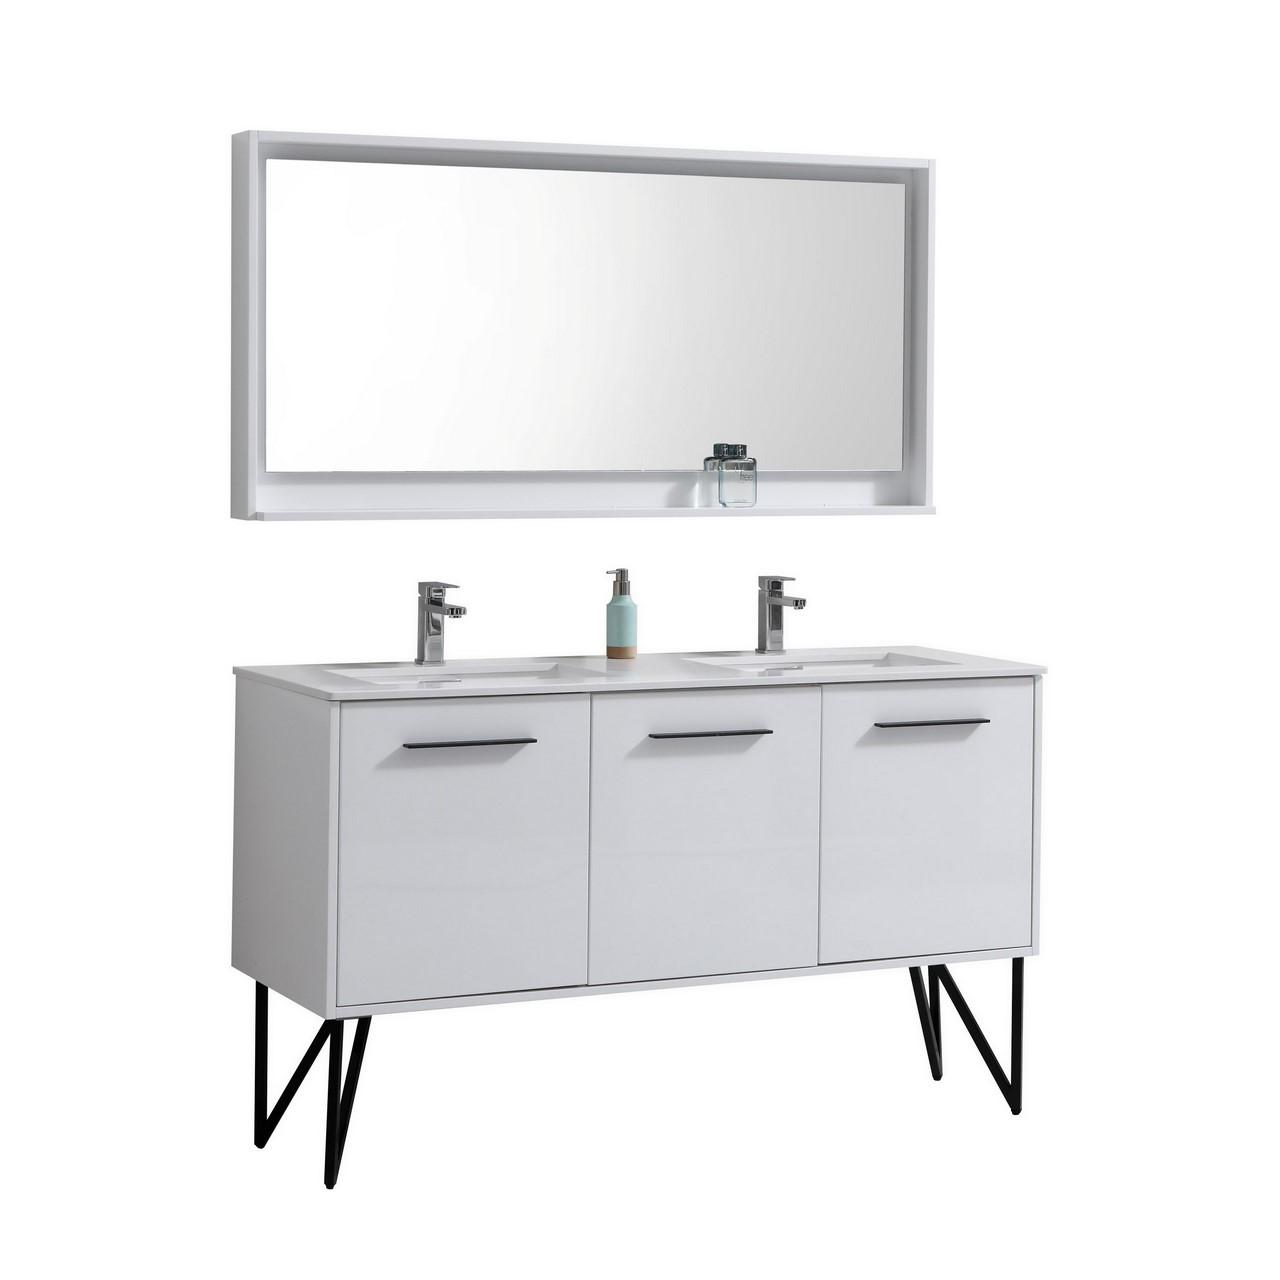 Forest 60 High Gloss White Vanity W Quartz Countertop